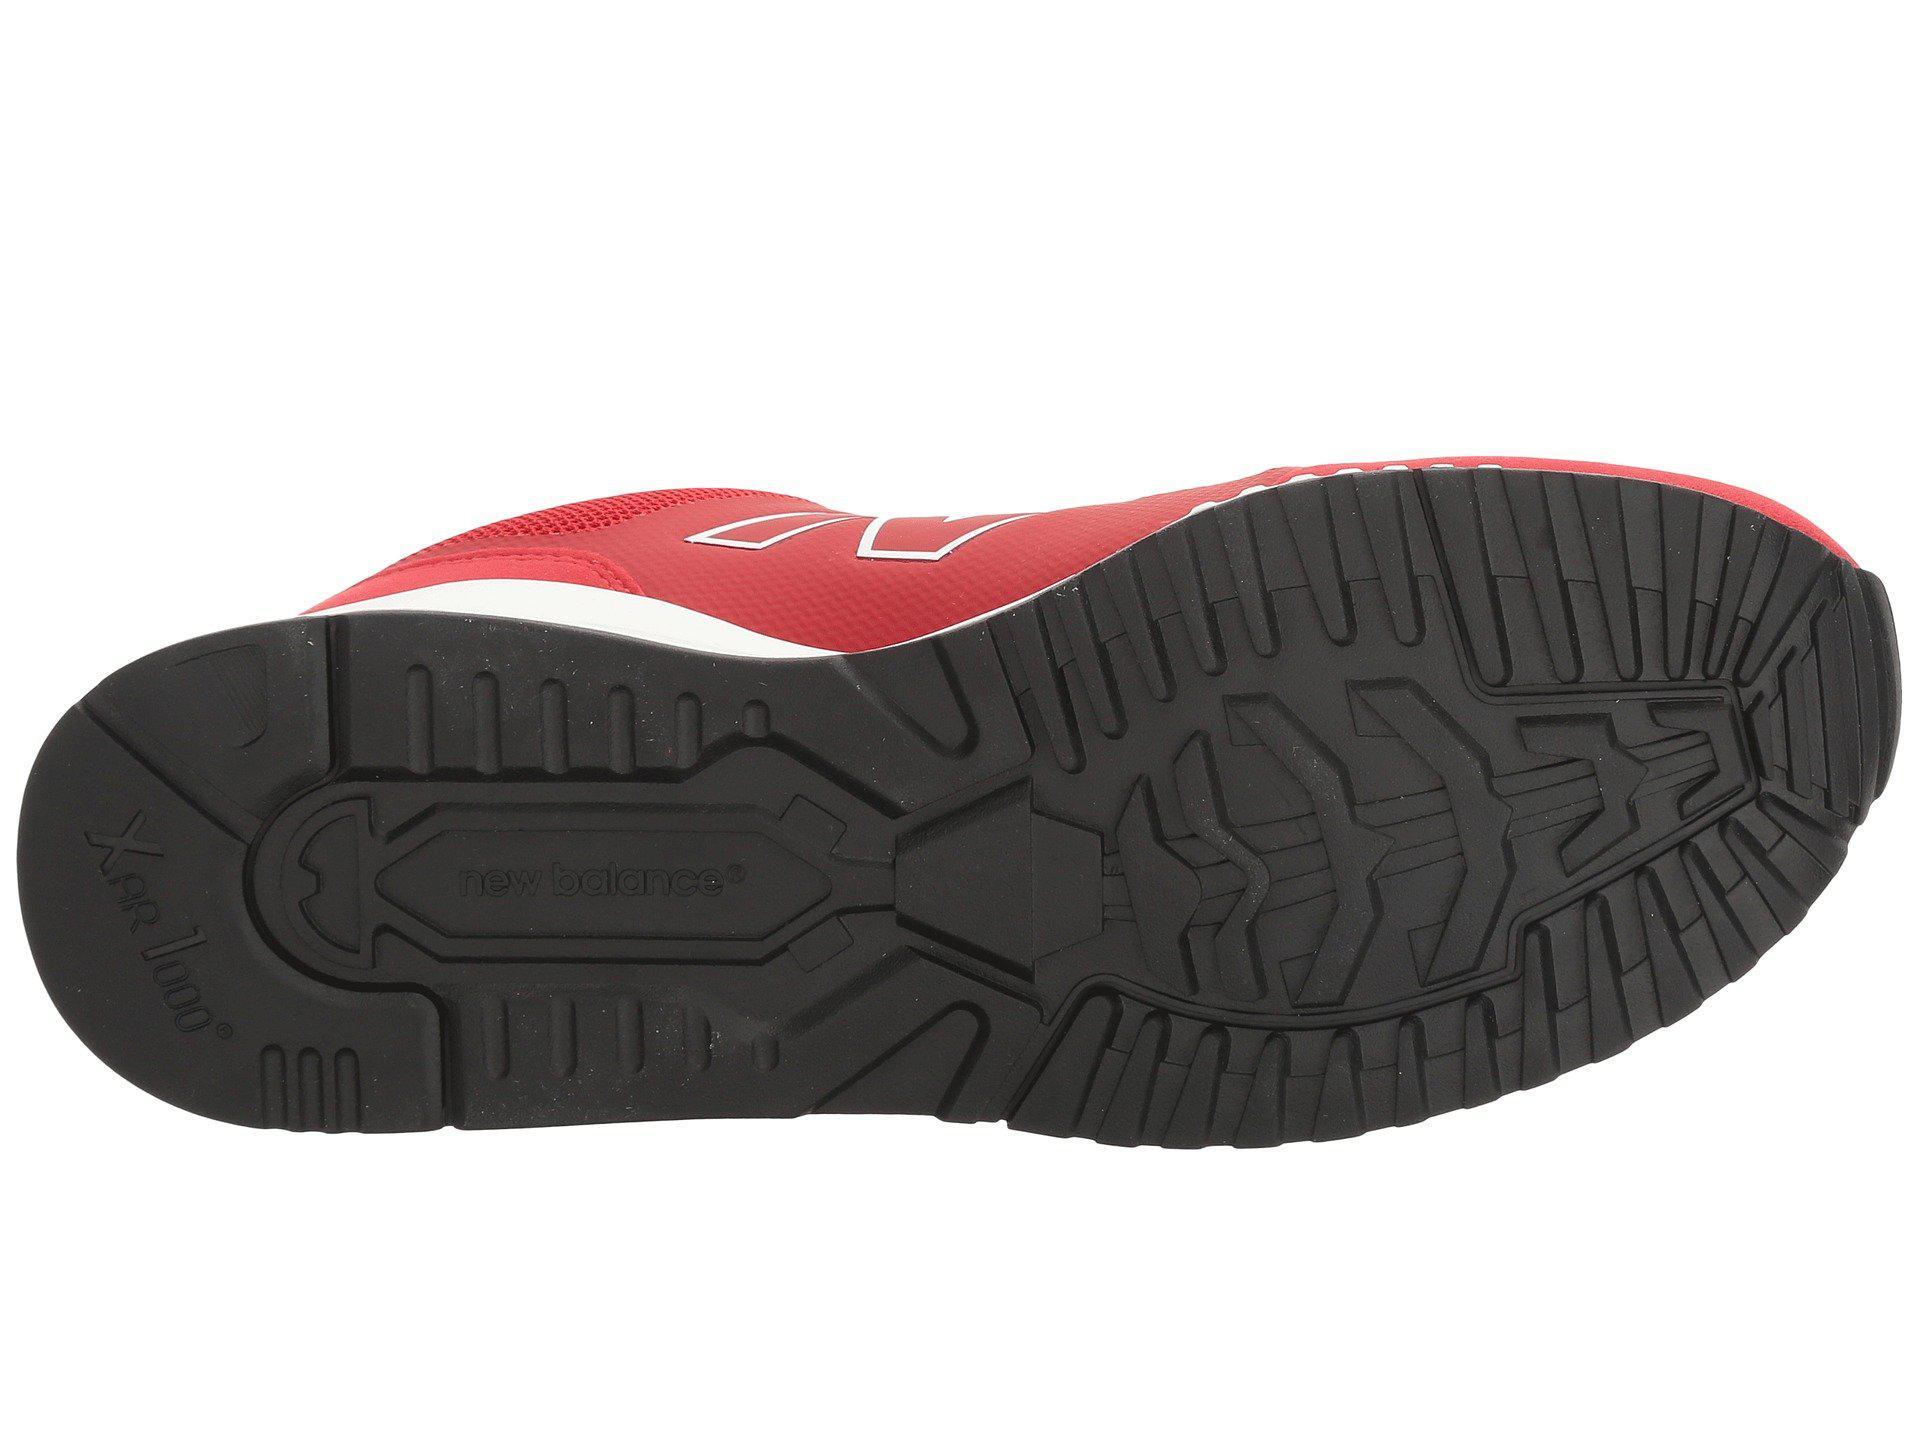 scarpe new balance uomo 2017 mrl005